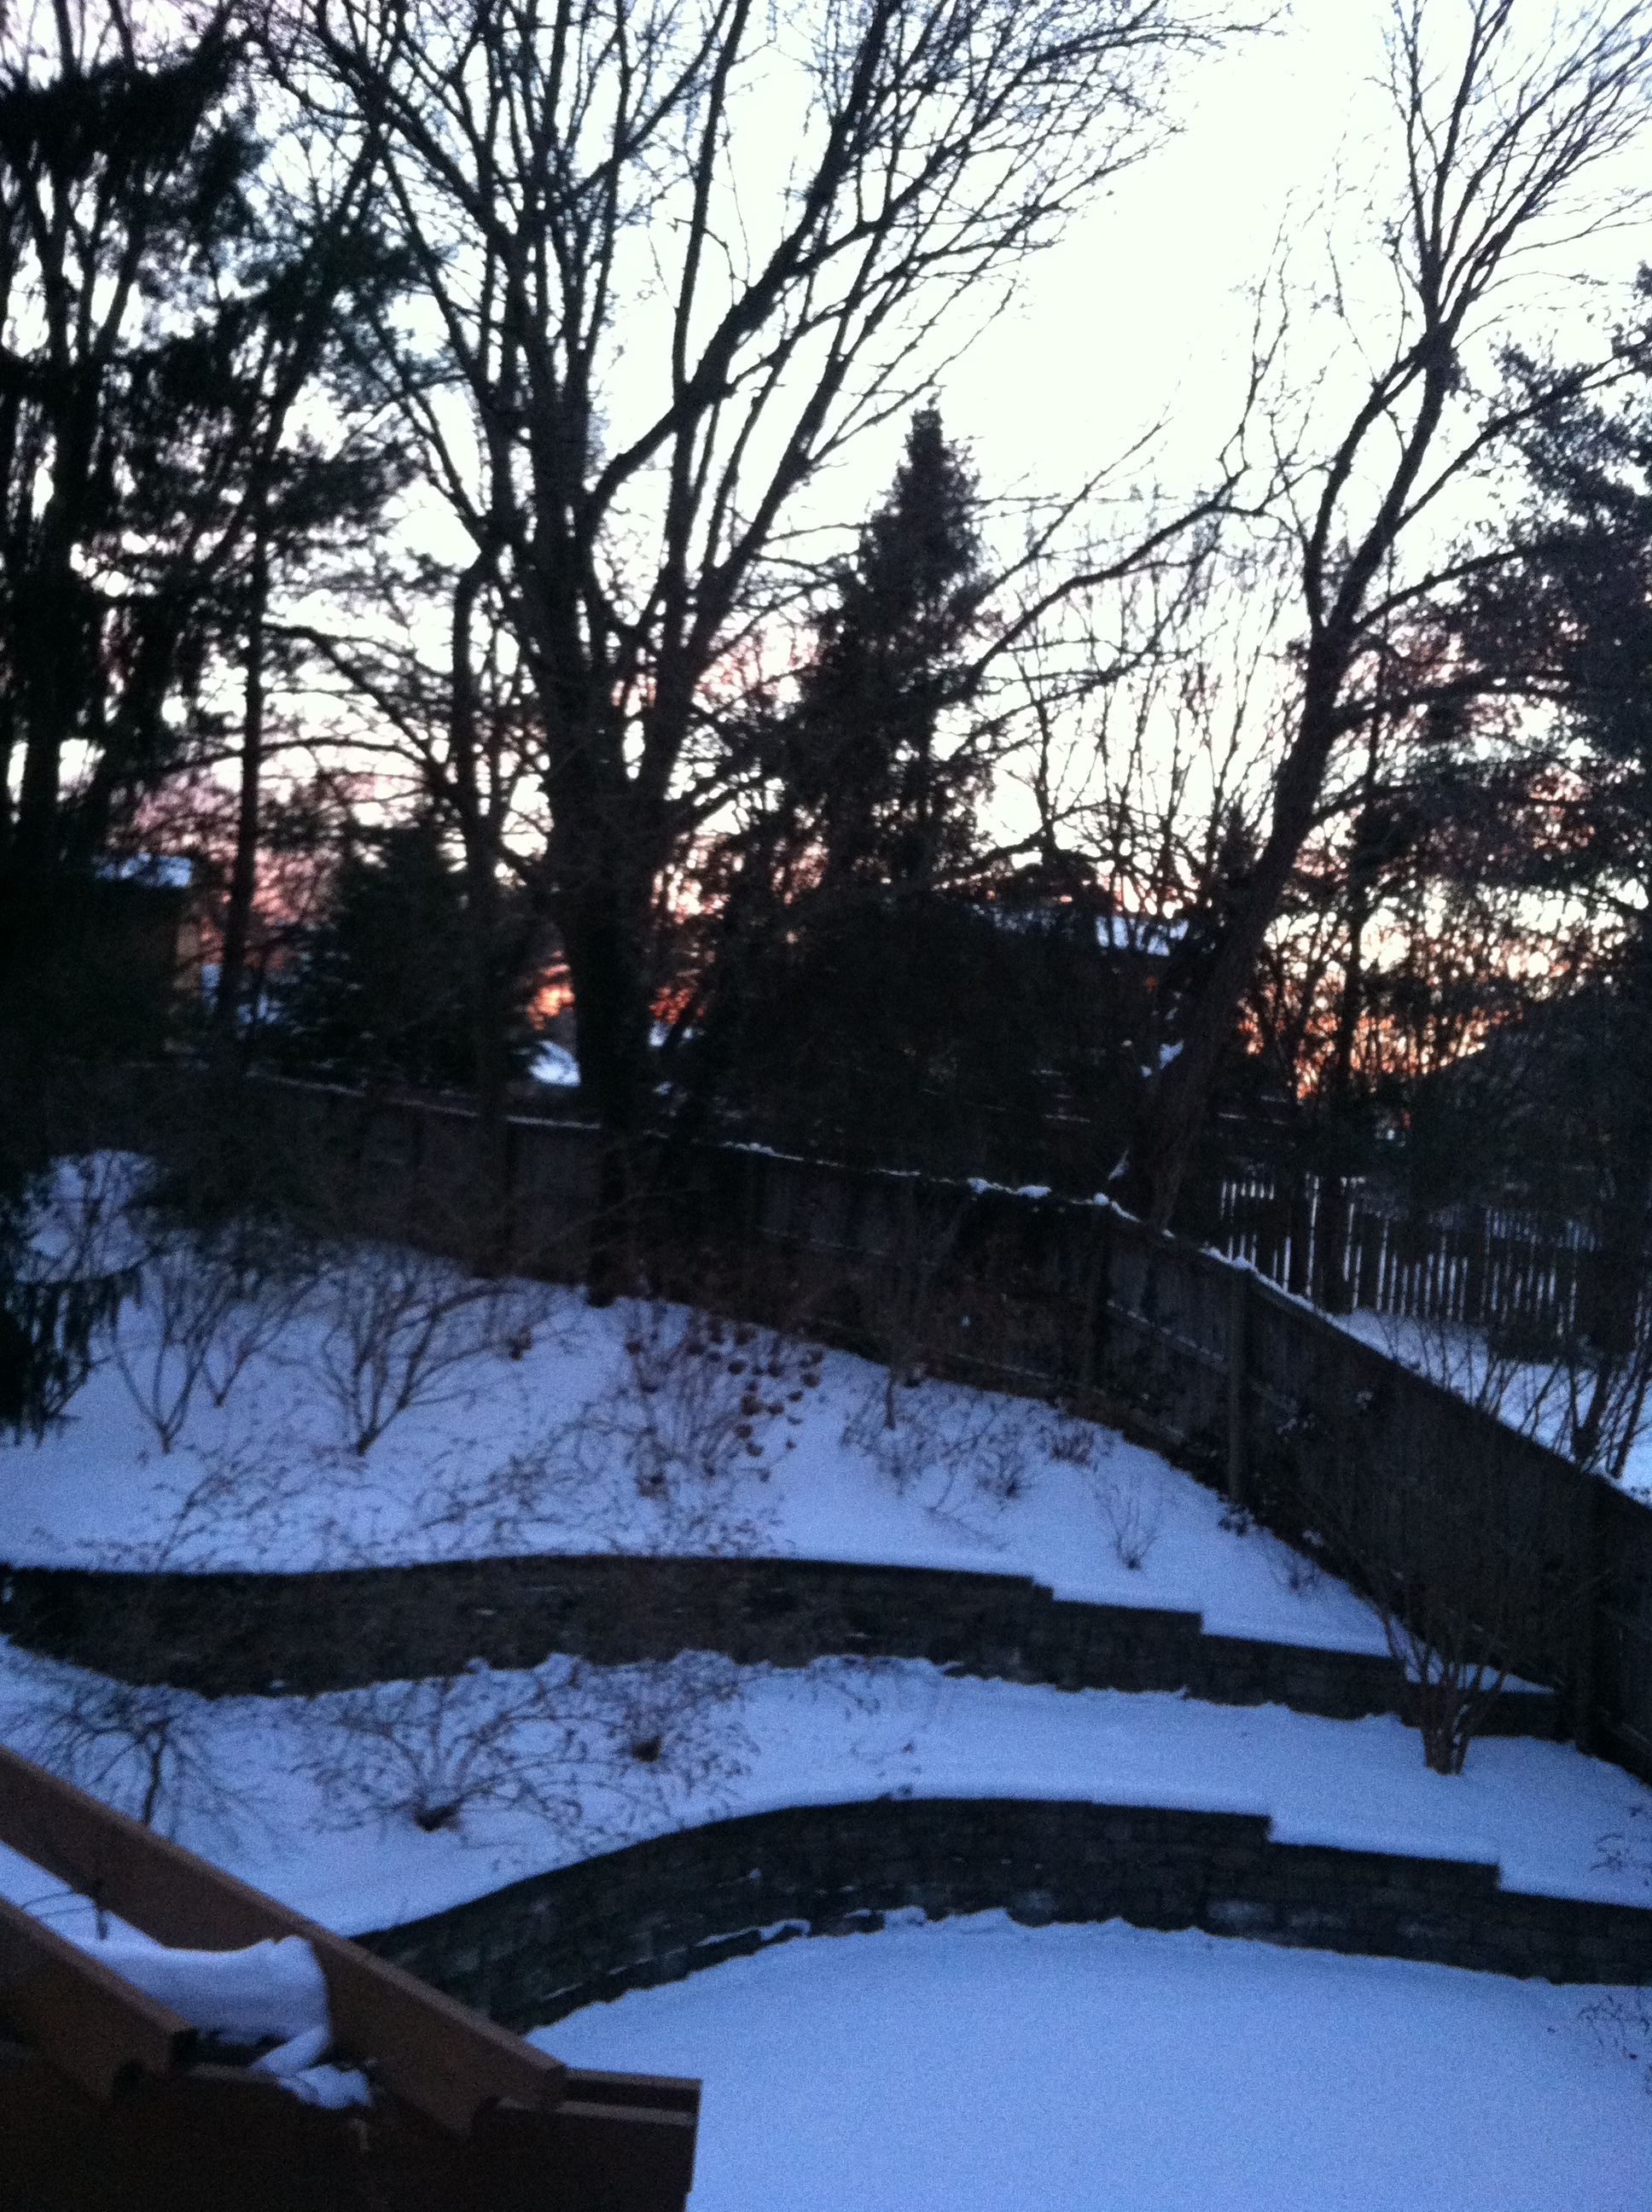 The cold night silent prayer